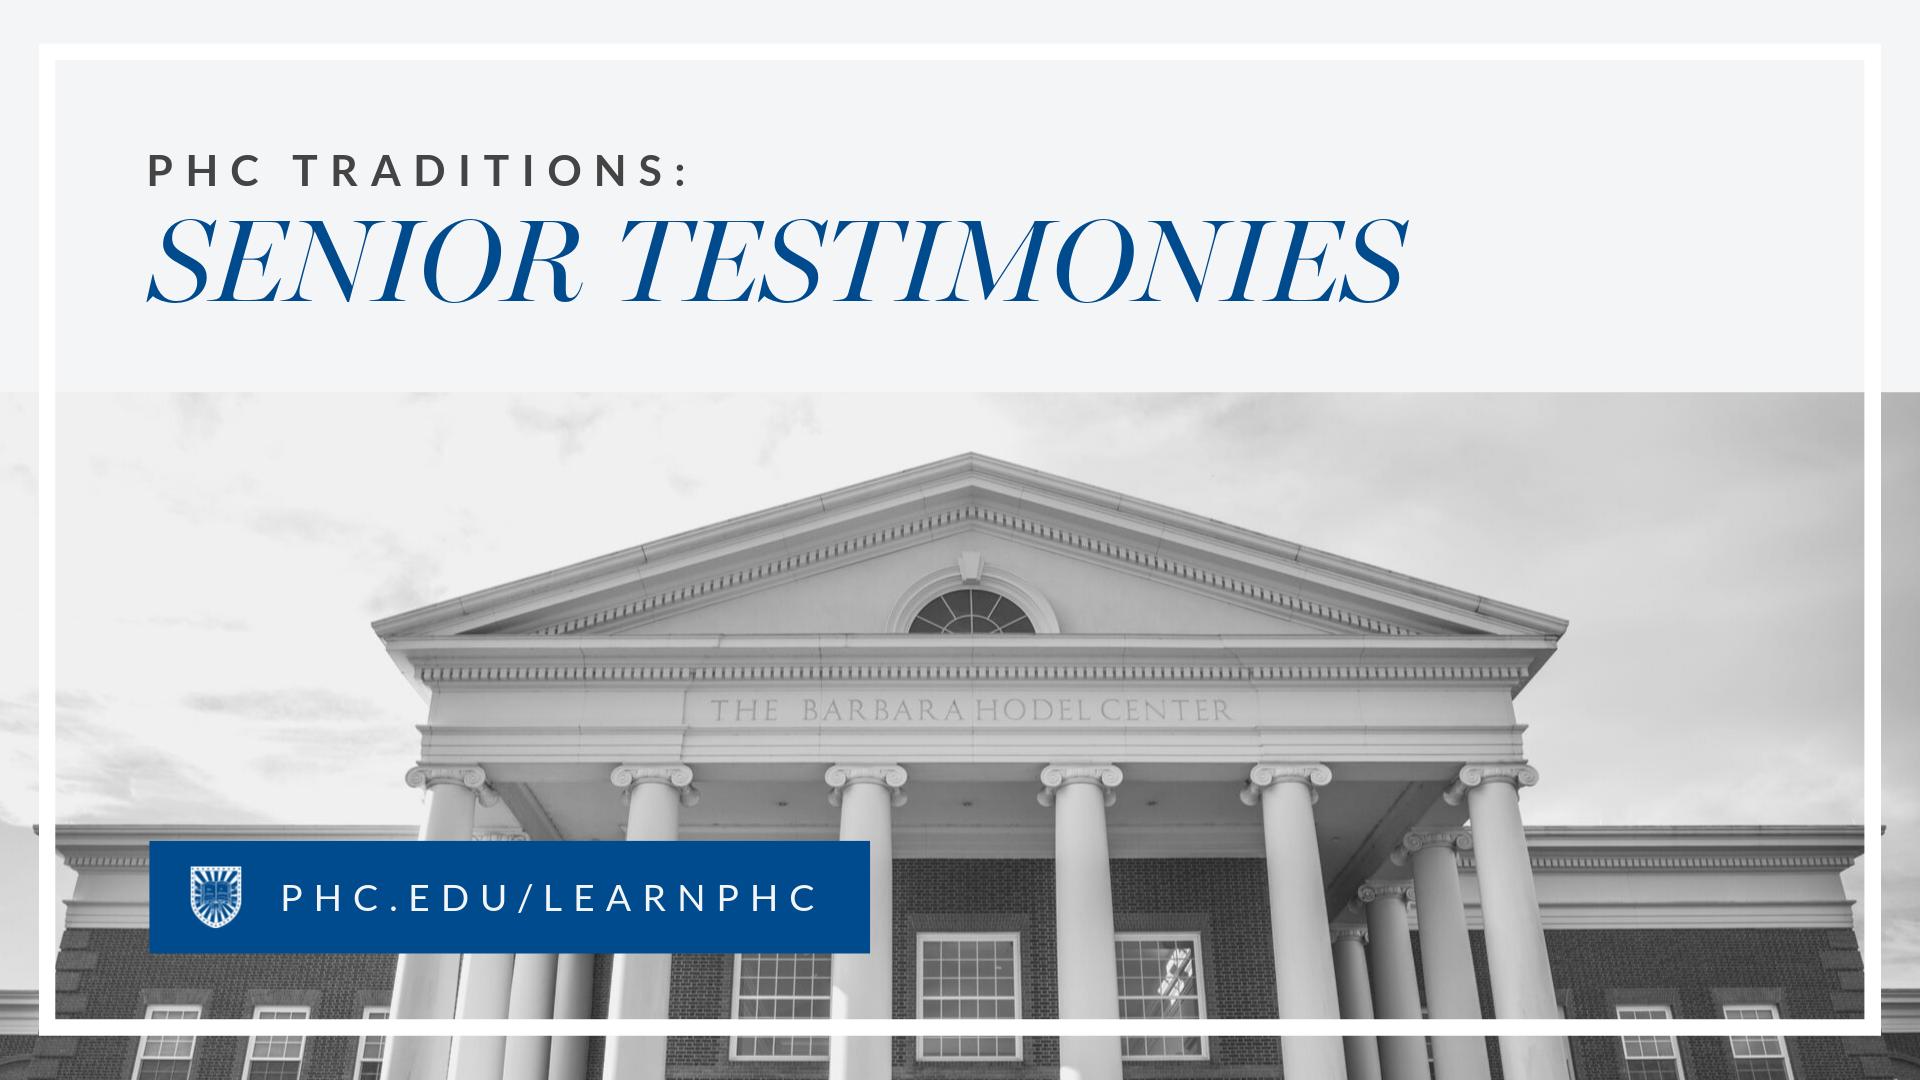 Senior Testimonies